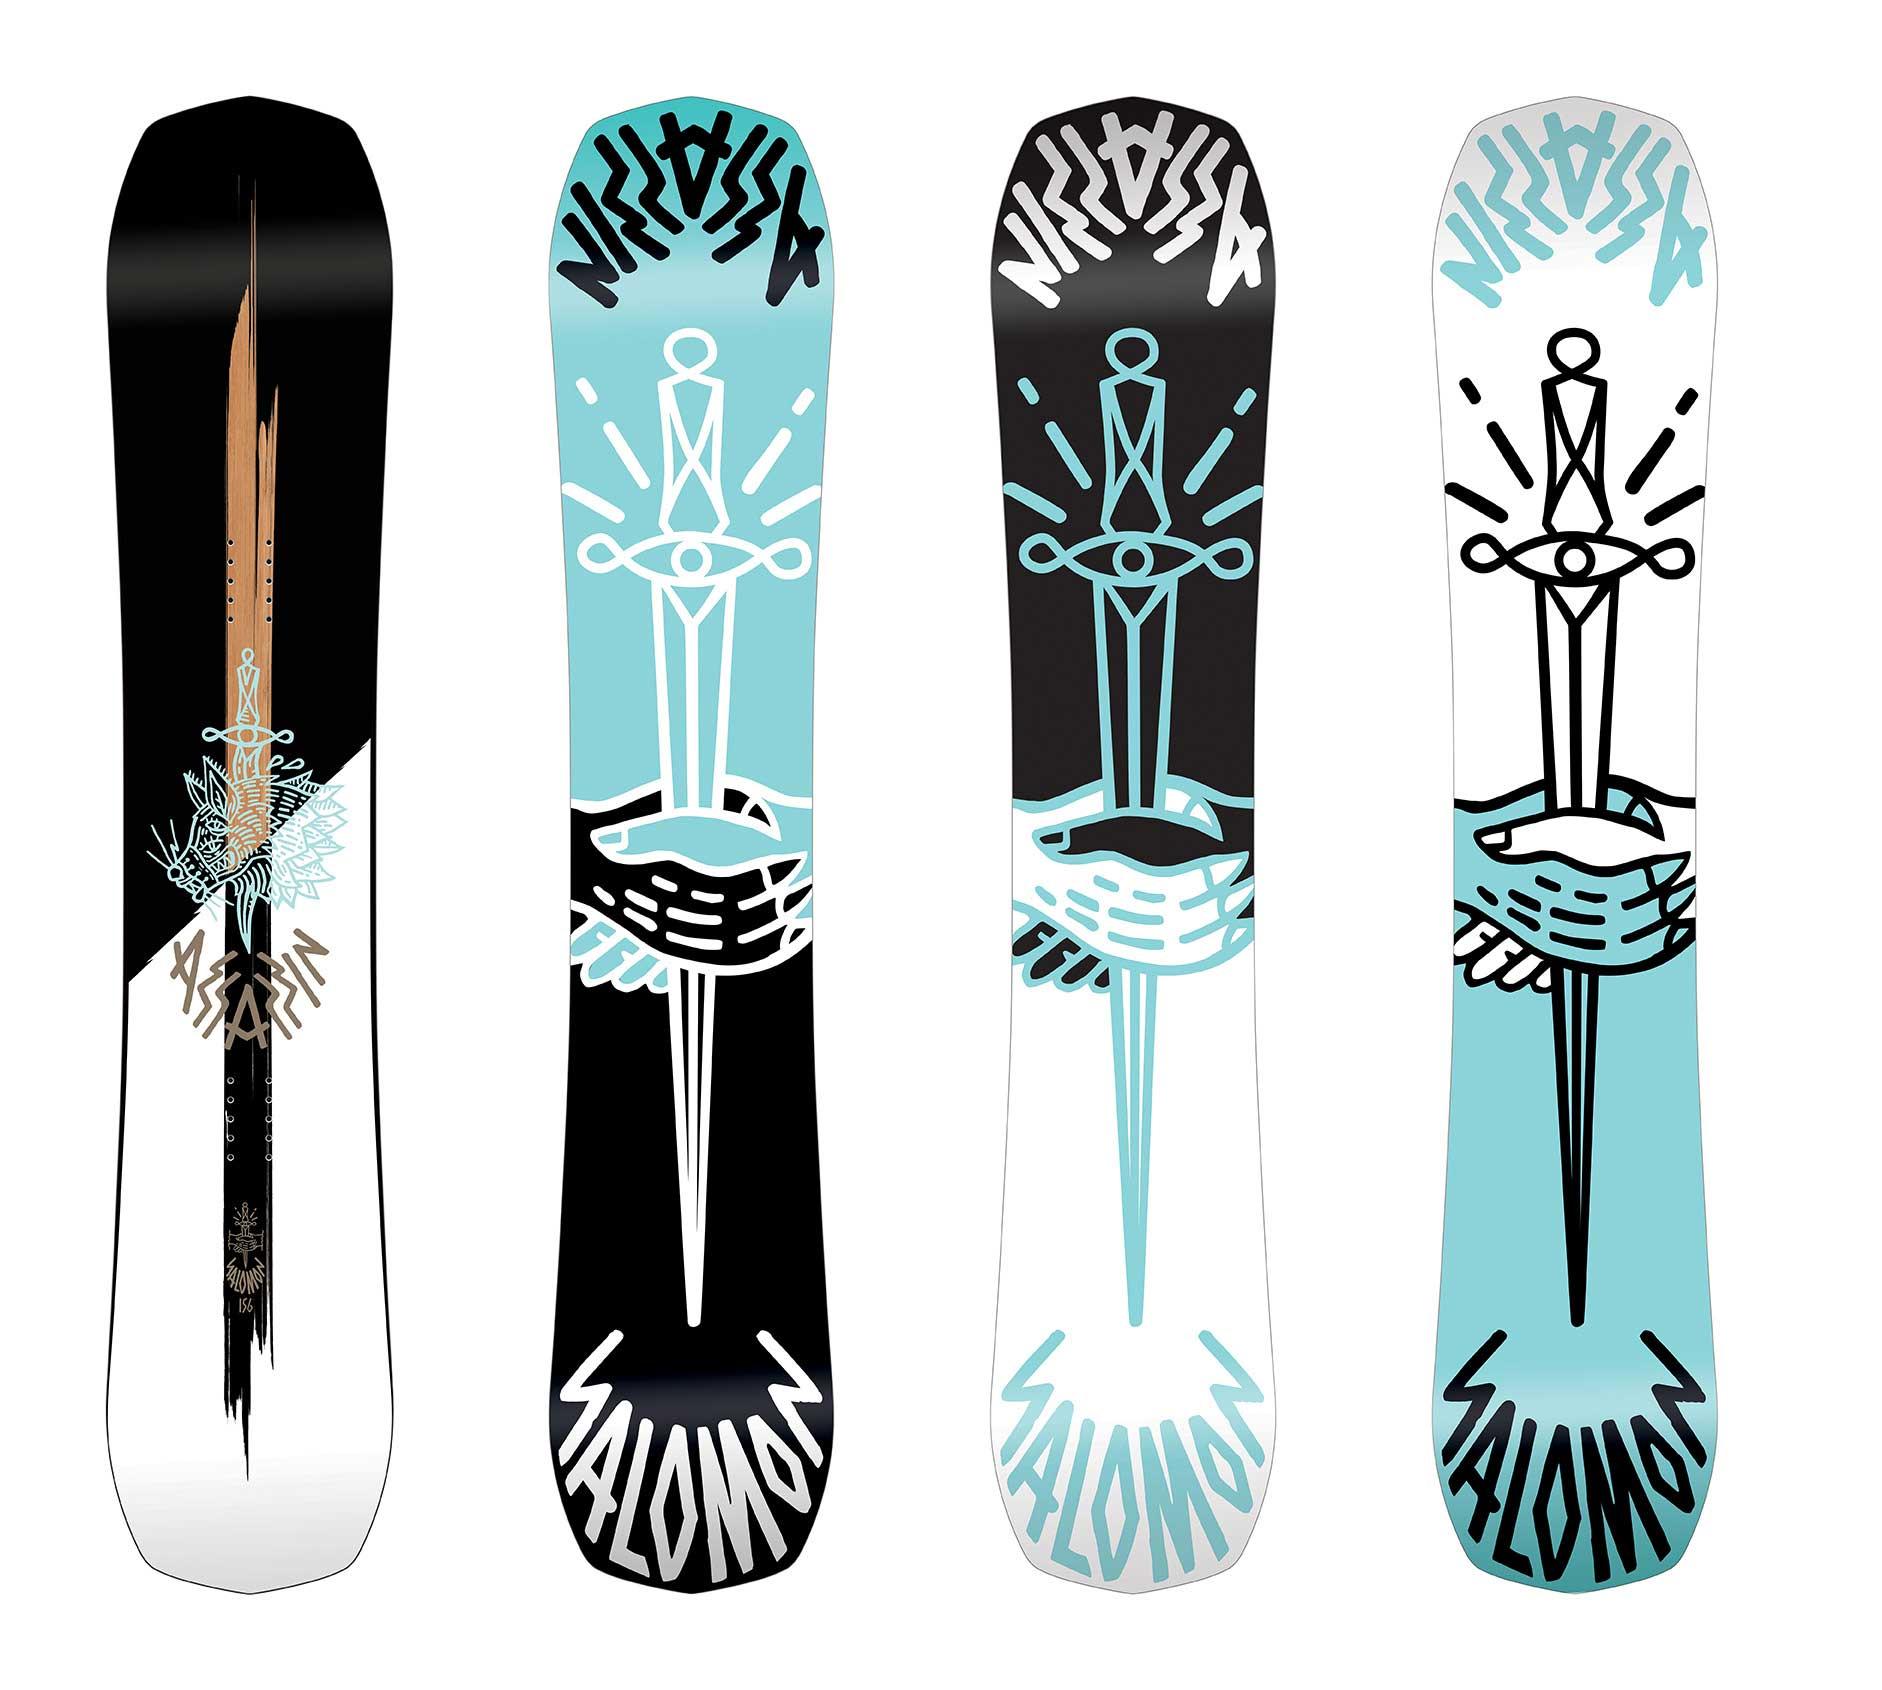 Salomon Assassin Snowboard Wide 158cm review